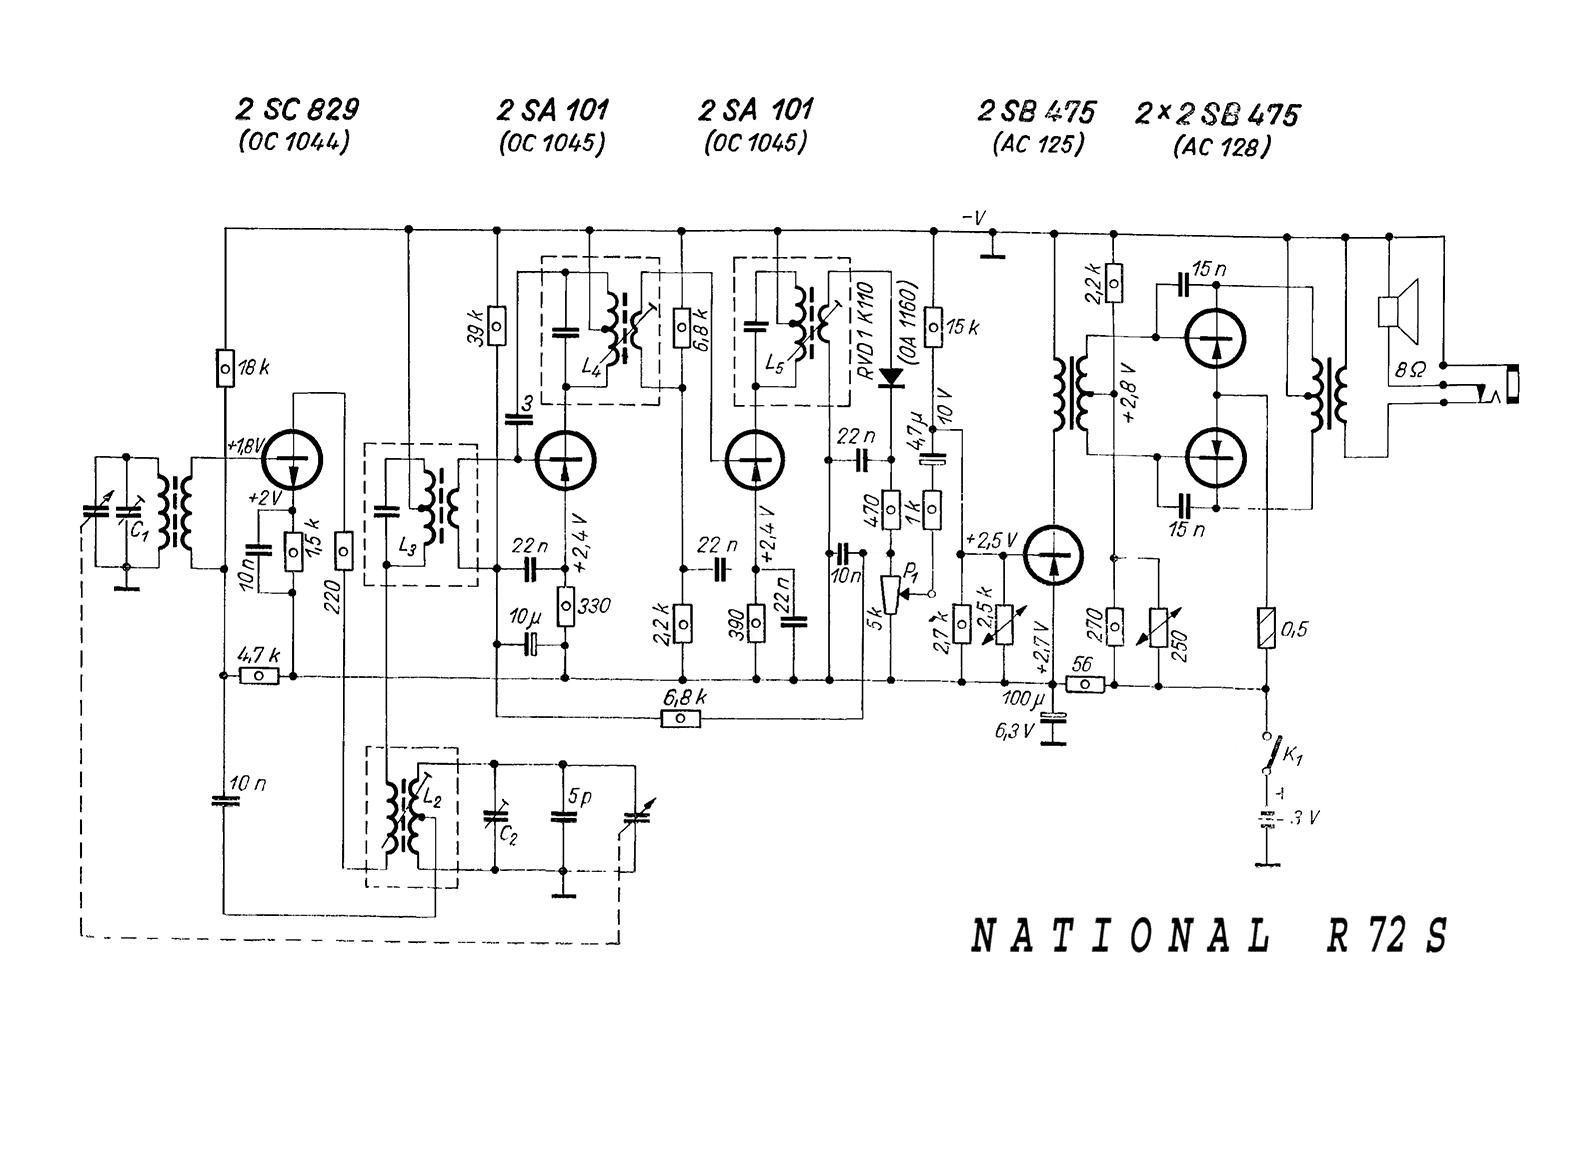 antique radio forums u2022 view topic help service manual schematic rh antiqueradios com panasonic sx5 schematic diagram panasonic schematic diagram tc-14la2